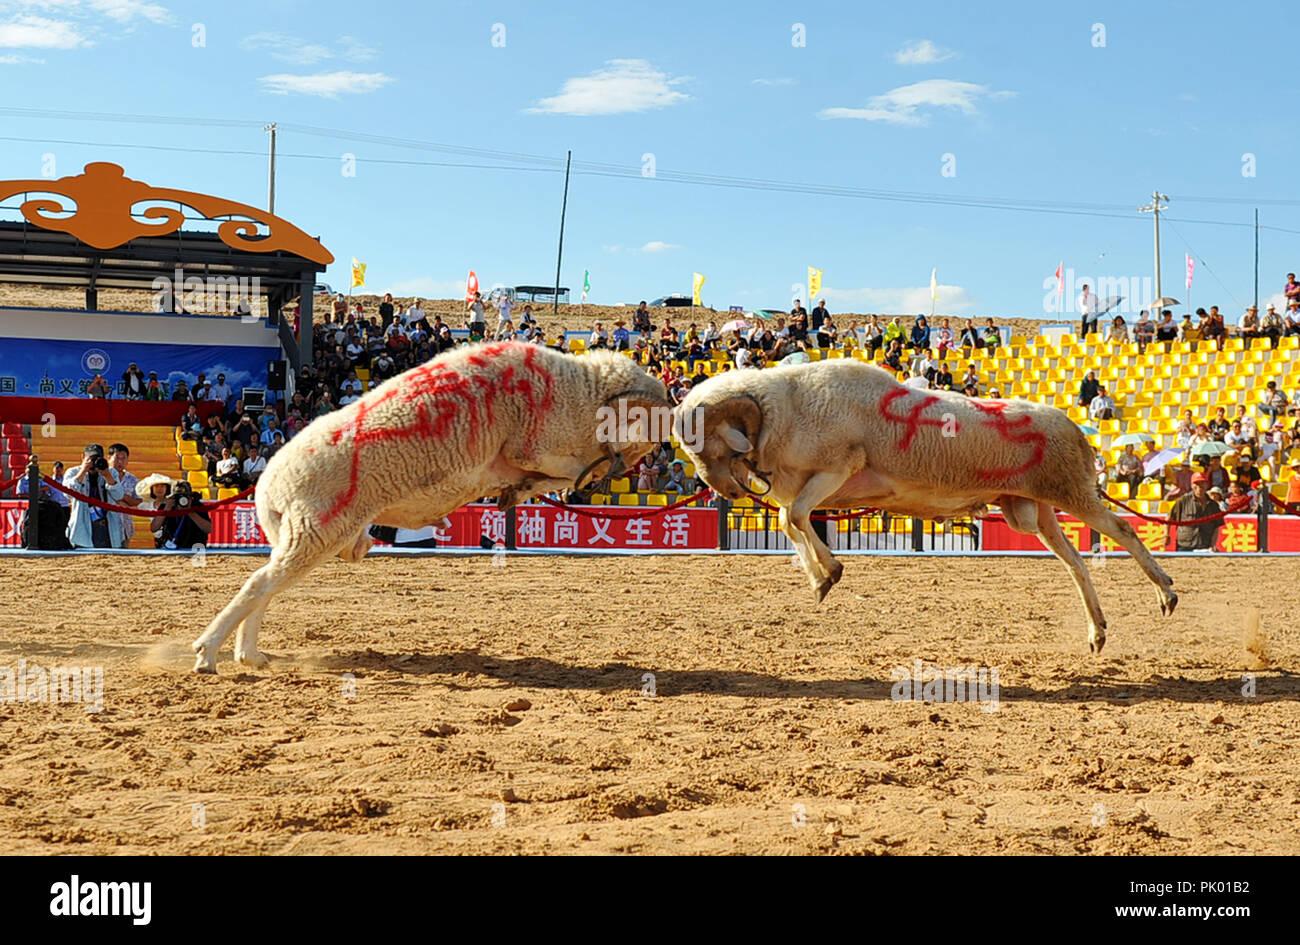 Zhangjiak, Zhangjiak, China. 10th Sep, 2018. Zhangjiakou, CHINA-The goat fighting is held in Zhangjiakou, north China's Hebei Province. Credit: SIPA Asia/ZUMA Wire/Alamy Live News - Stock Image